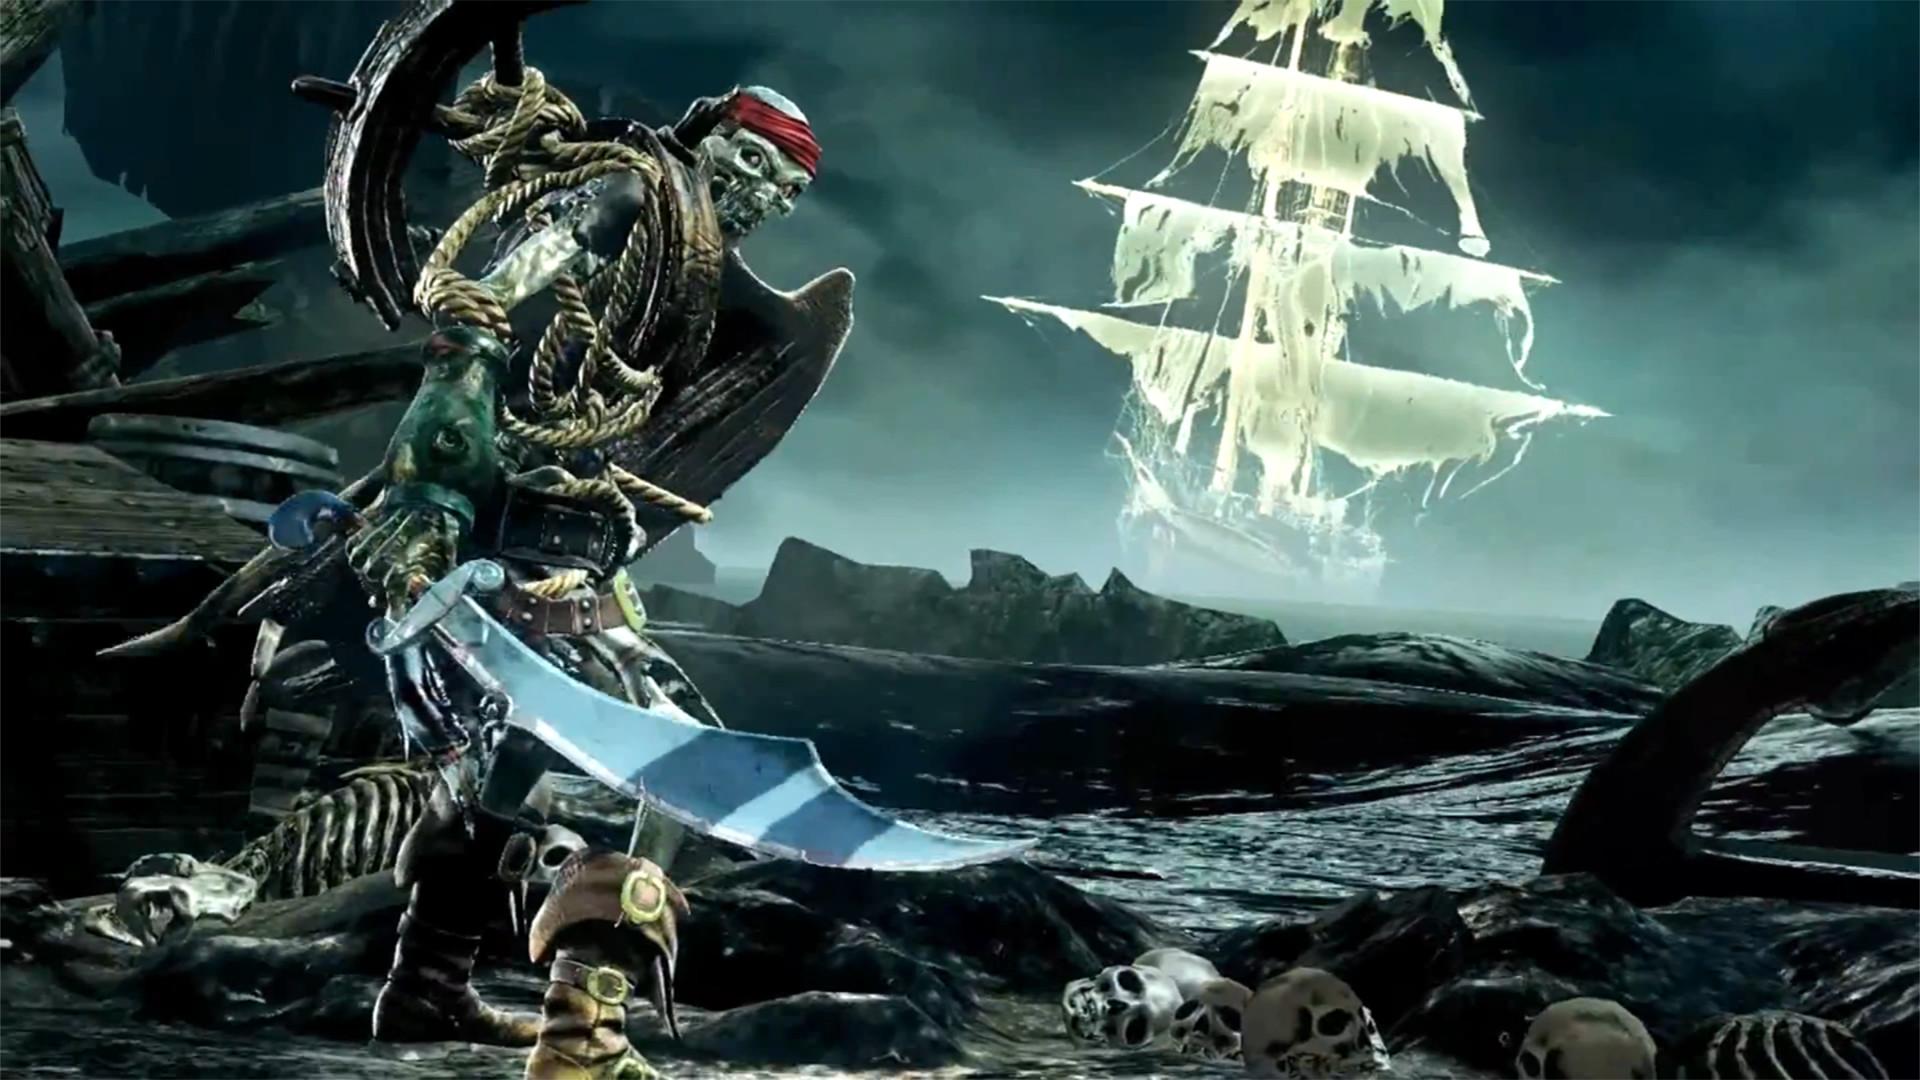 Killer Instinct Xbox One Wallpaper – WallpaperSafari